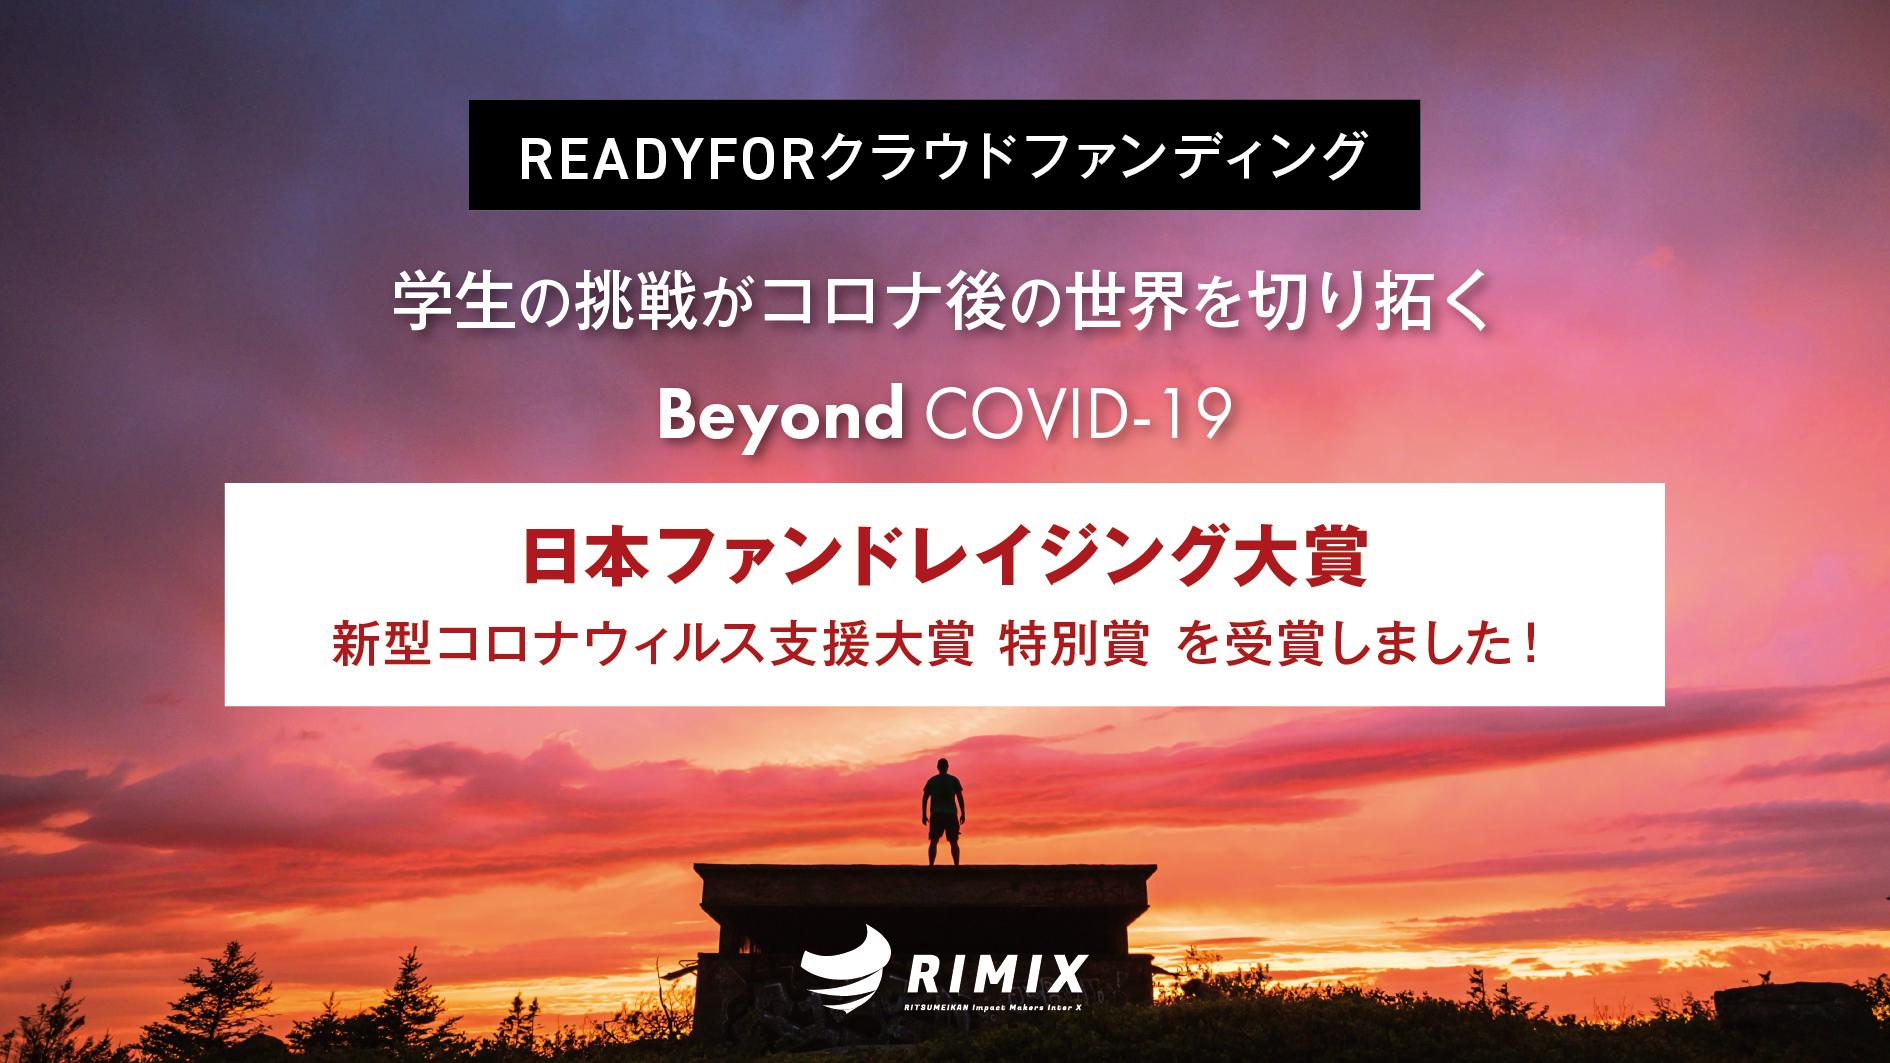 Beyond COVID-19のクラウドファンディングが「日本ファンドレイジング大賞」新型コロナウィルス支援大賞 特別賞を受賞しました